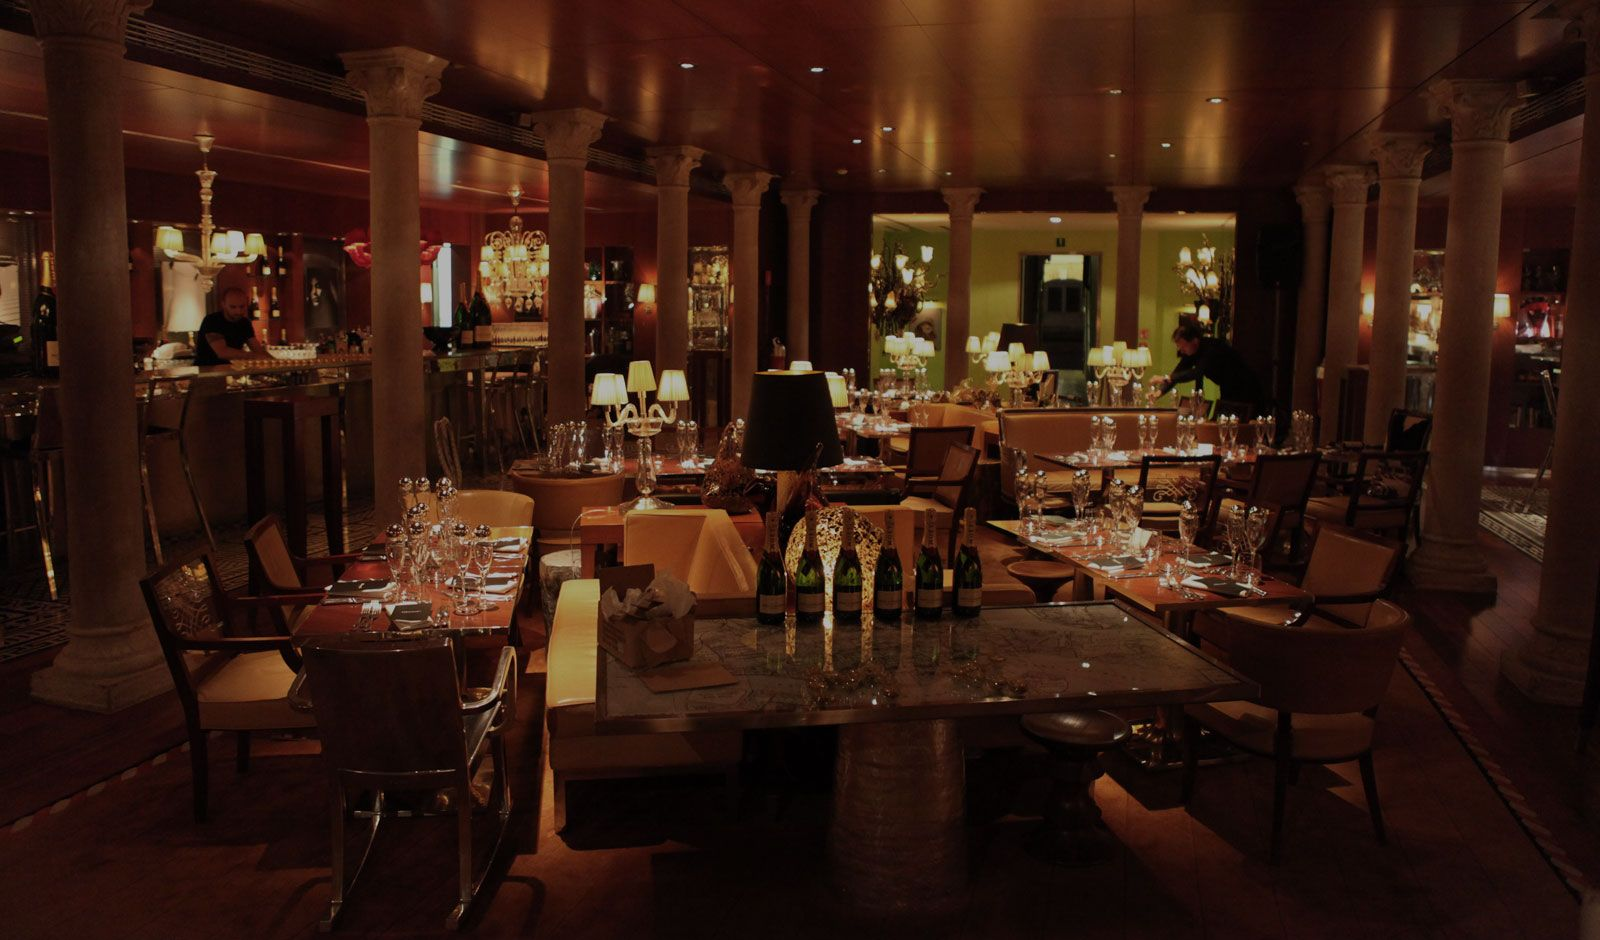 PalazzinaG Luxury Hotel Venice Italy | The Unconventional Luxury ...